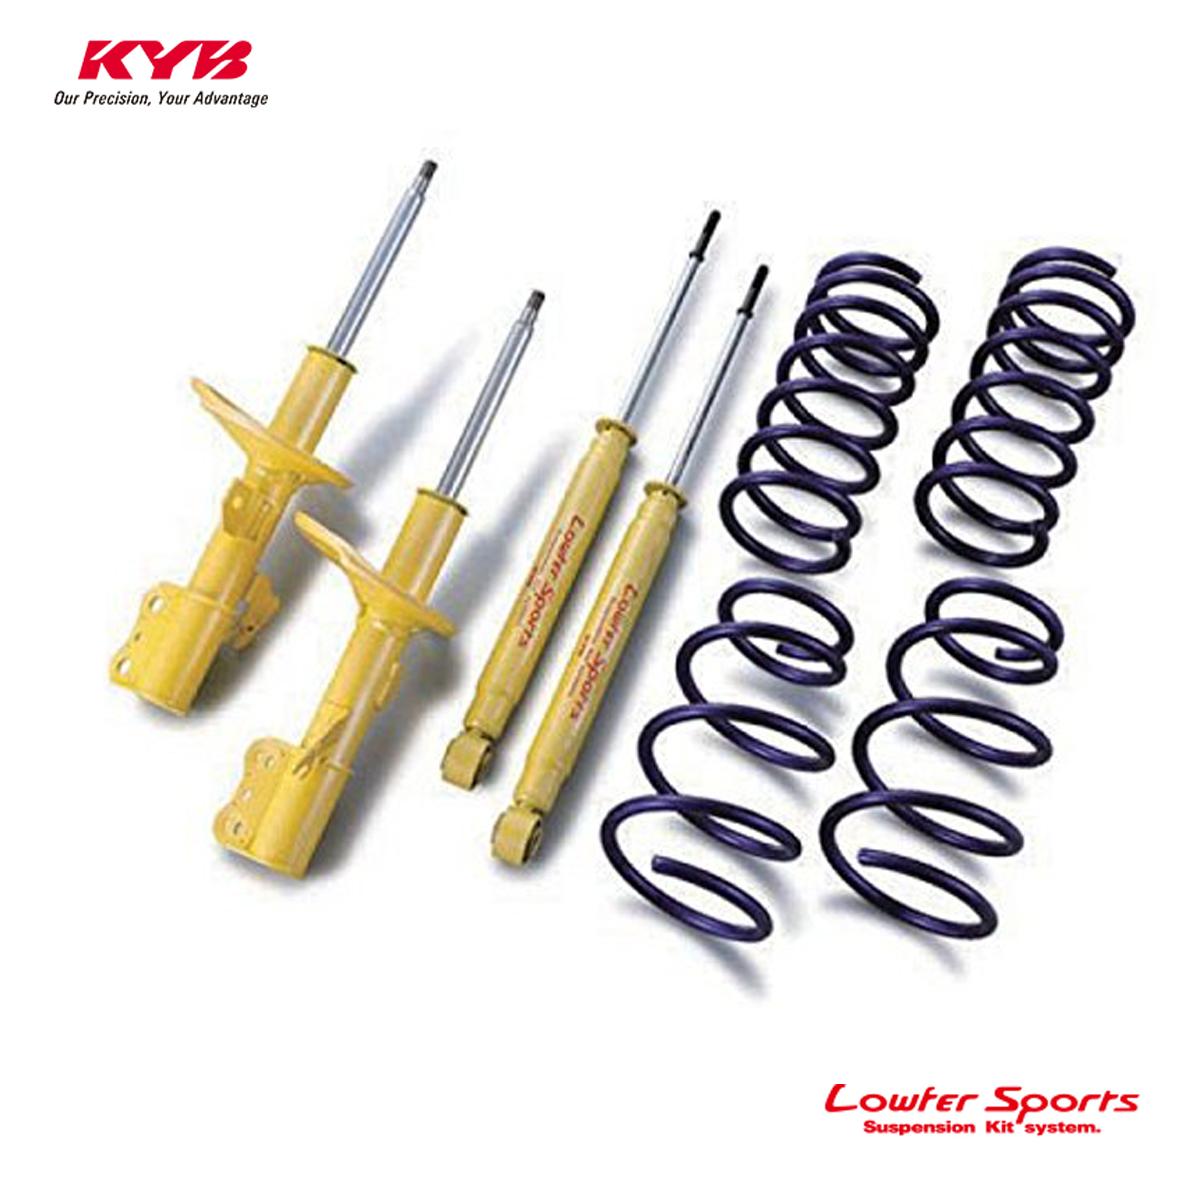 KYB カヤバ ムーヴカスタム LA100S ショックアブソーバー サスペンションキット Lowfer Sports LKIT-LA100SRS 配送先条件有り